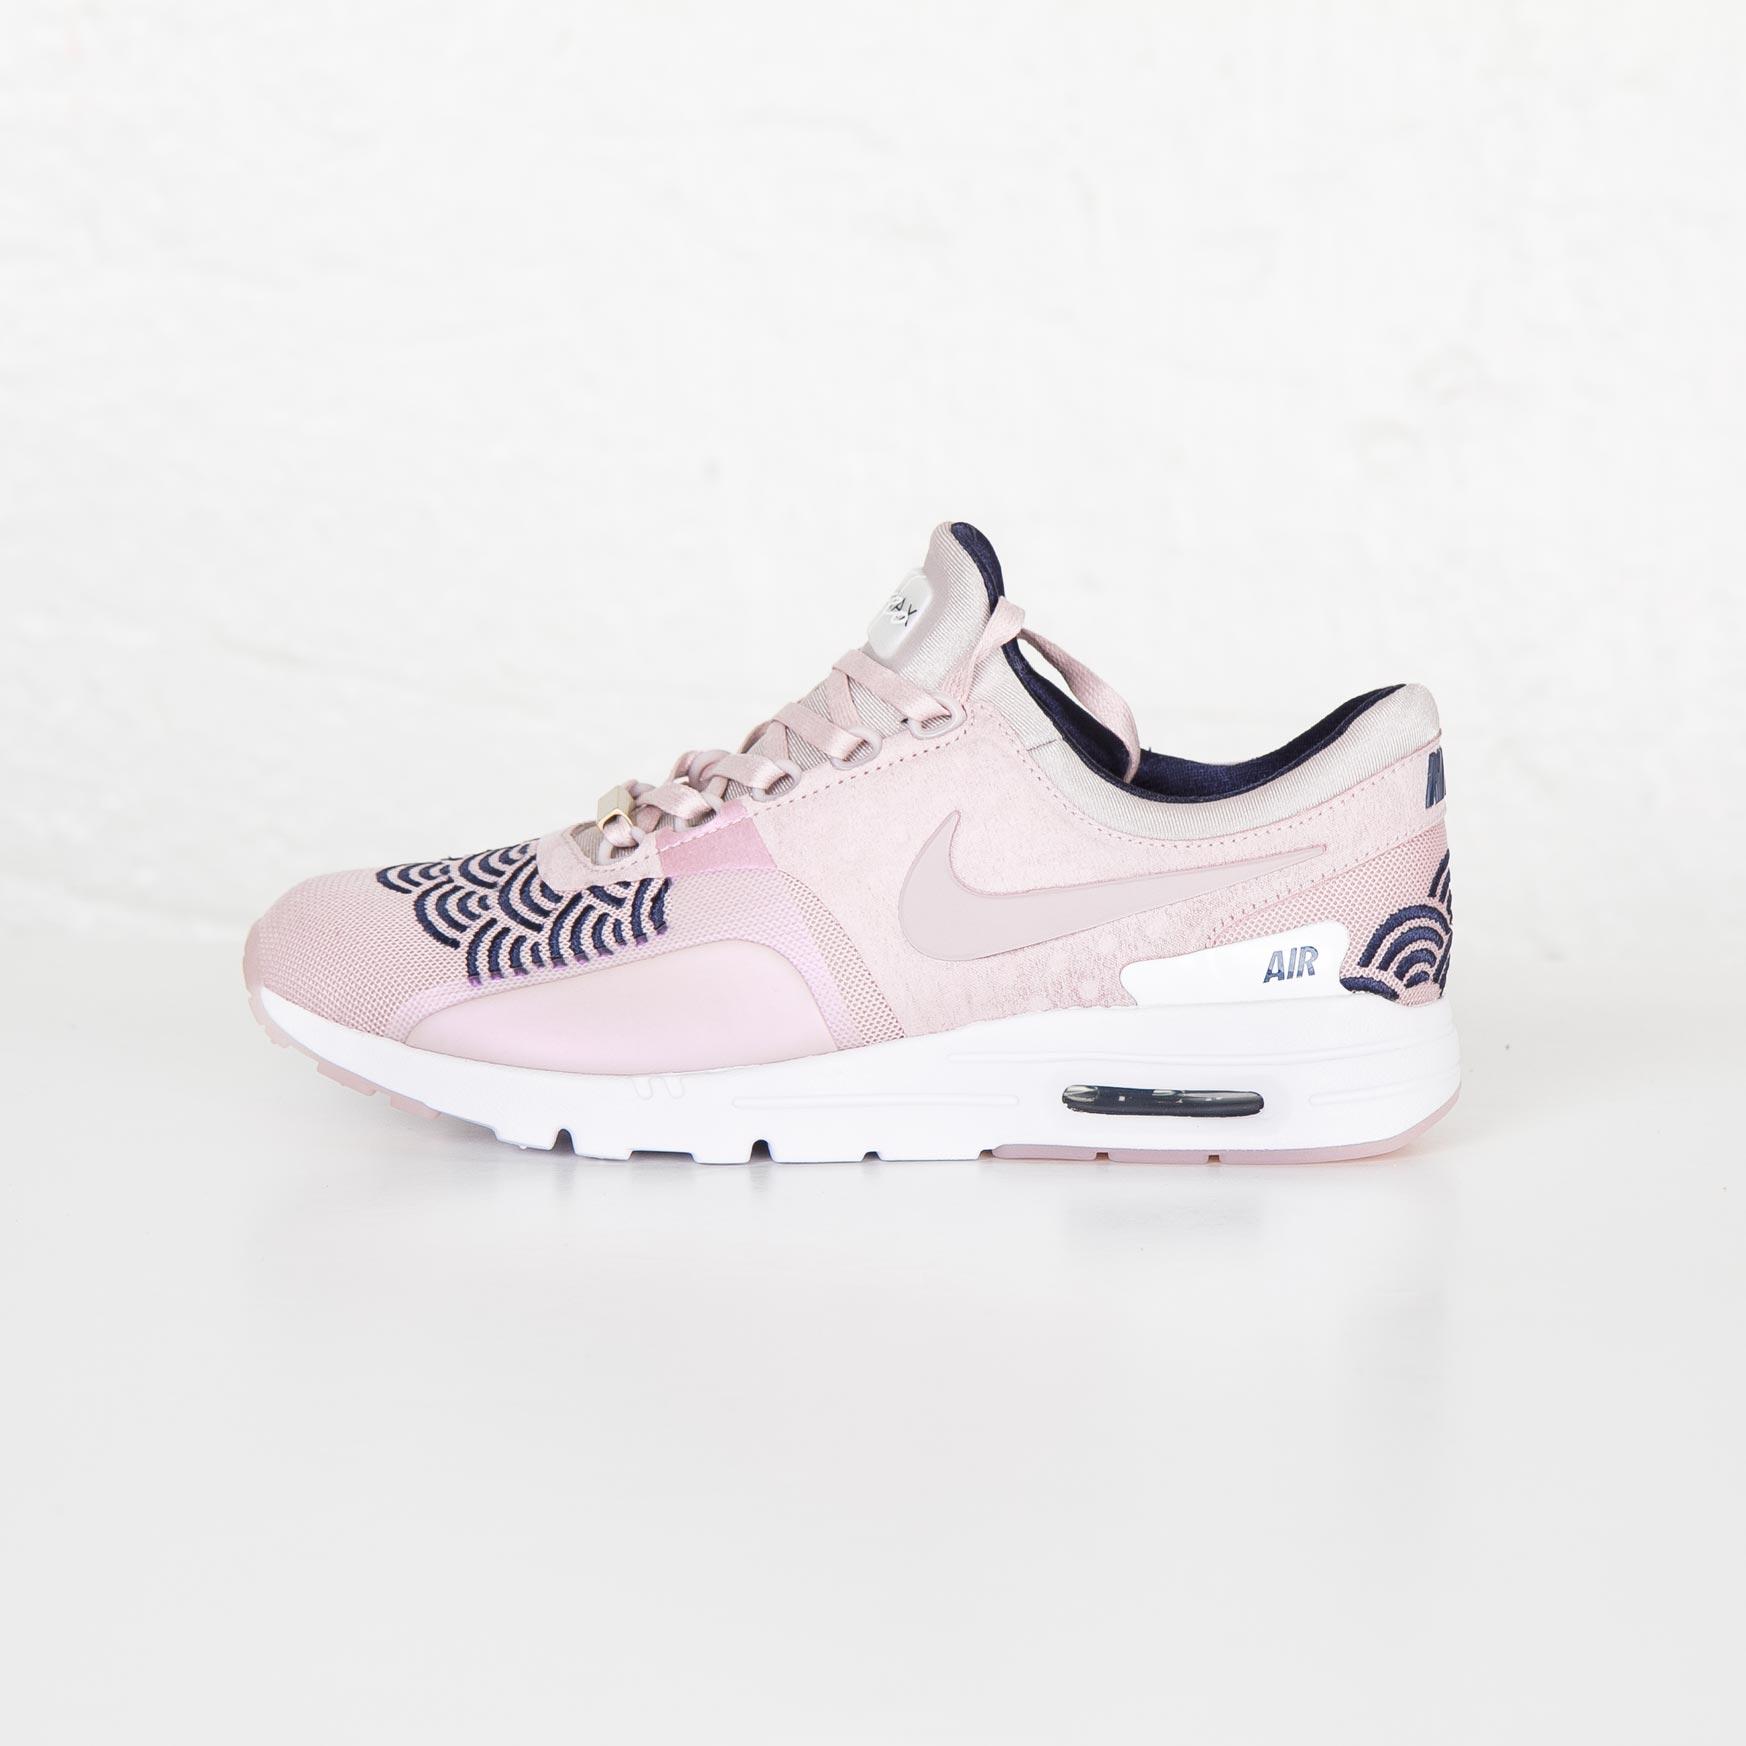 364d40fdab Nike W Air Max Zero LOTC QS - 847125-600 - Sneakersnstuff | sneakers &  streetwear online since 1999